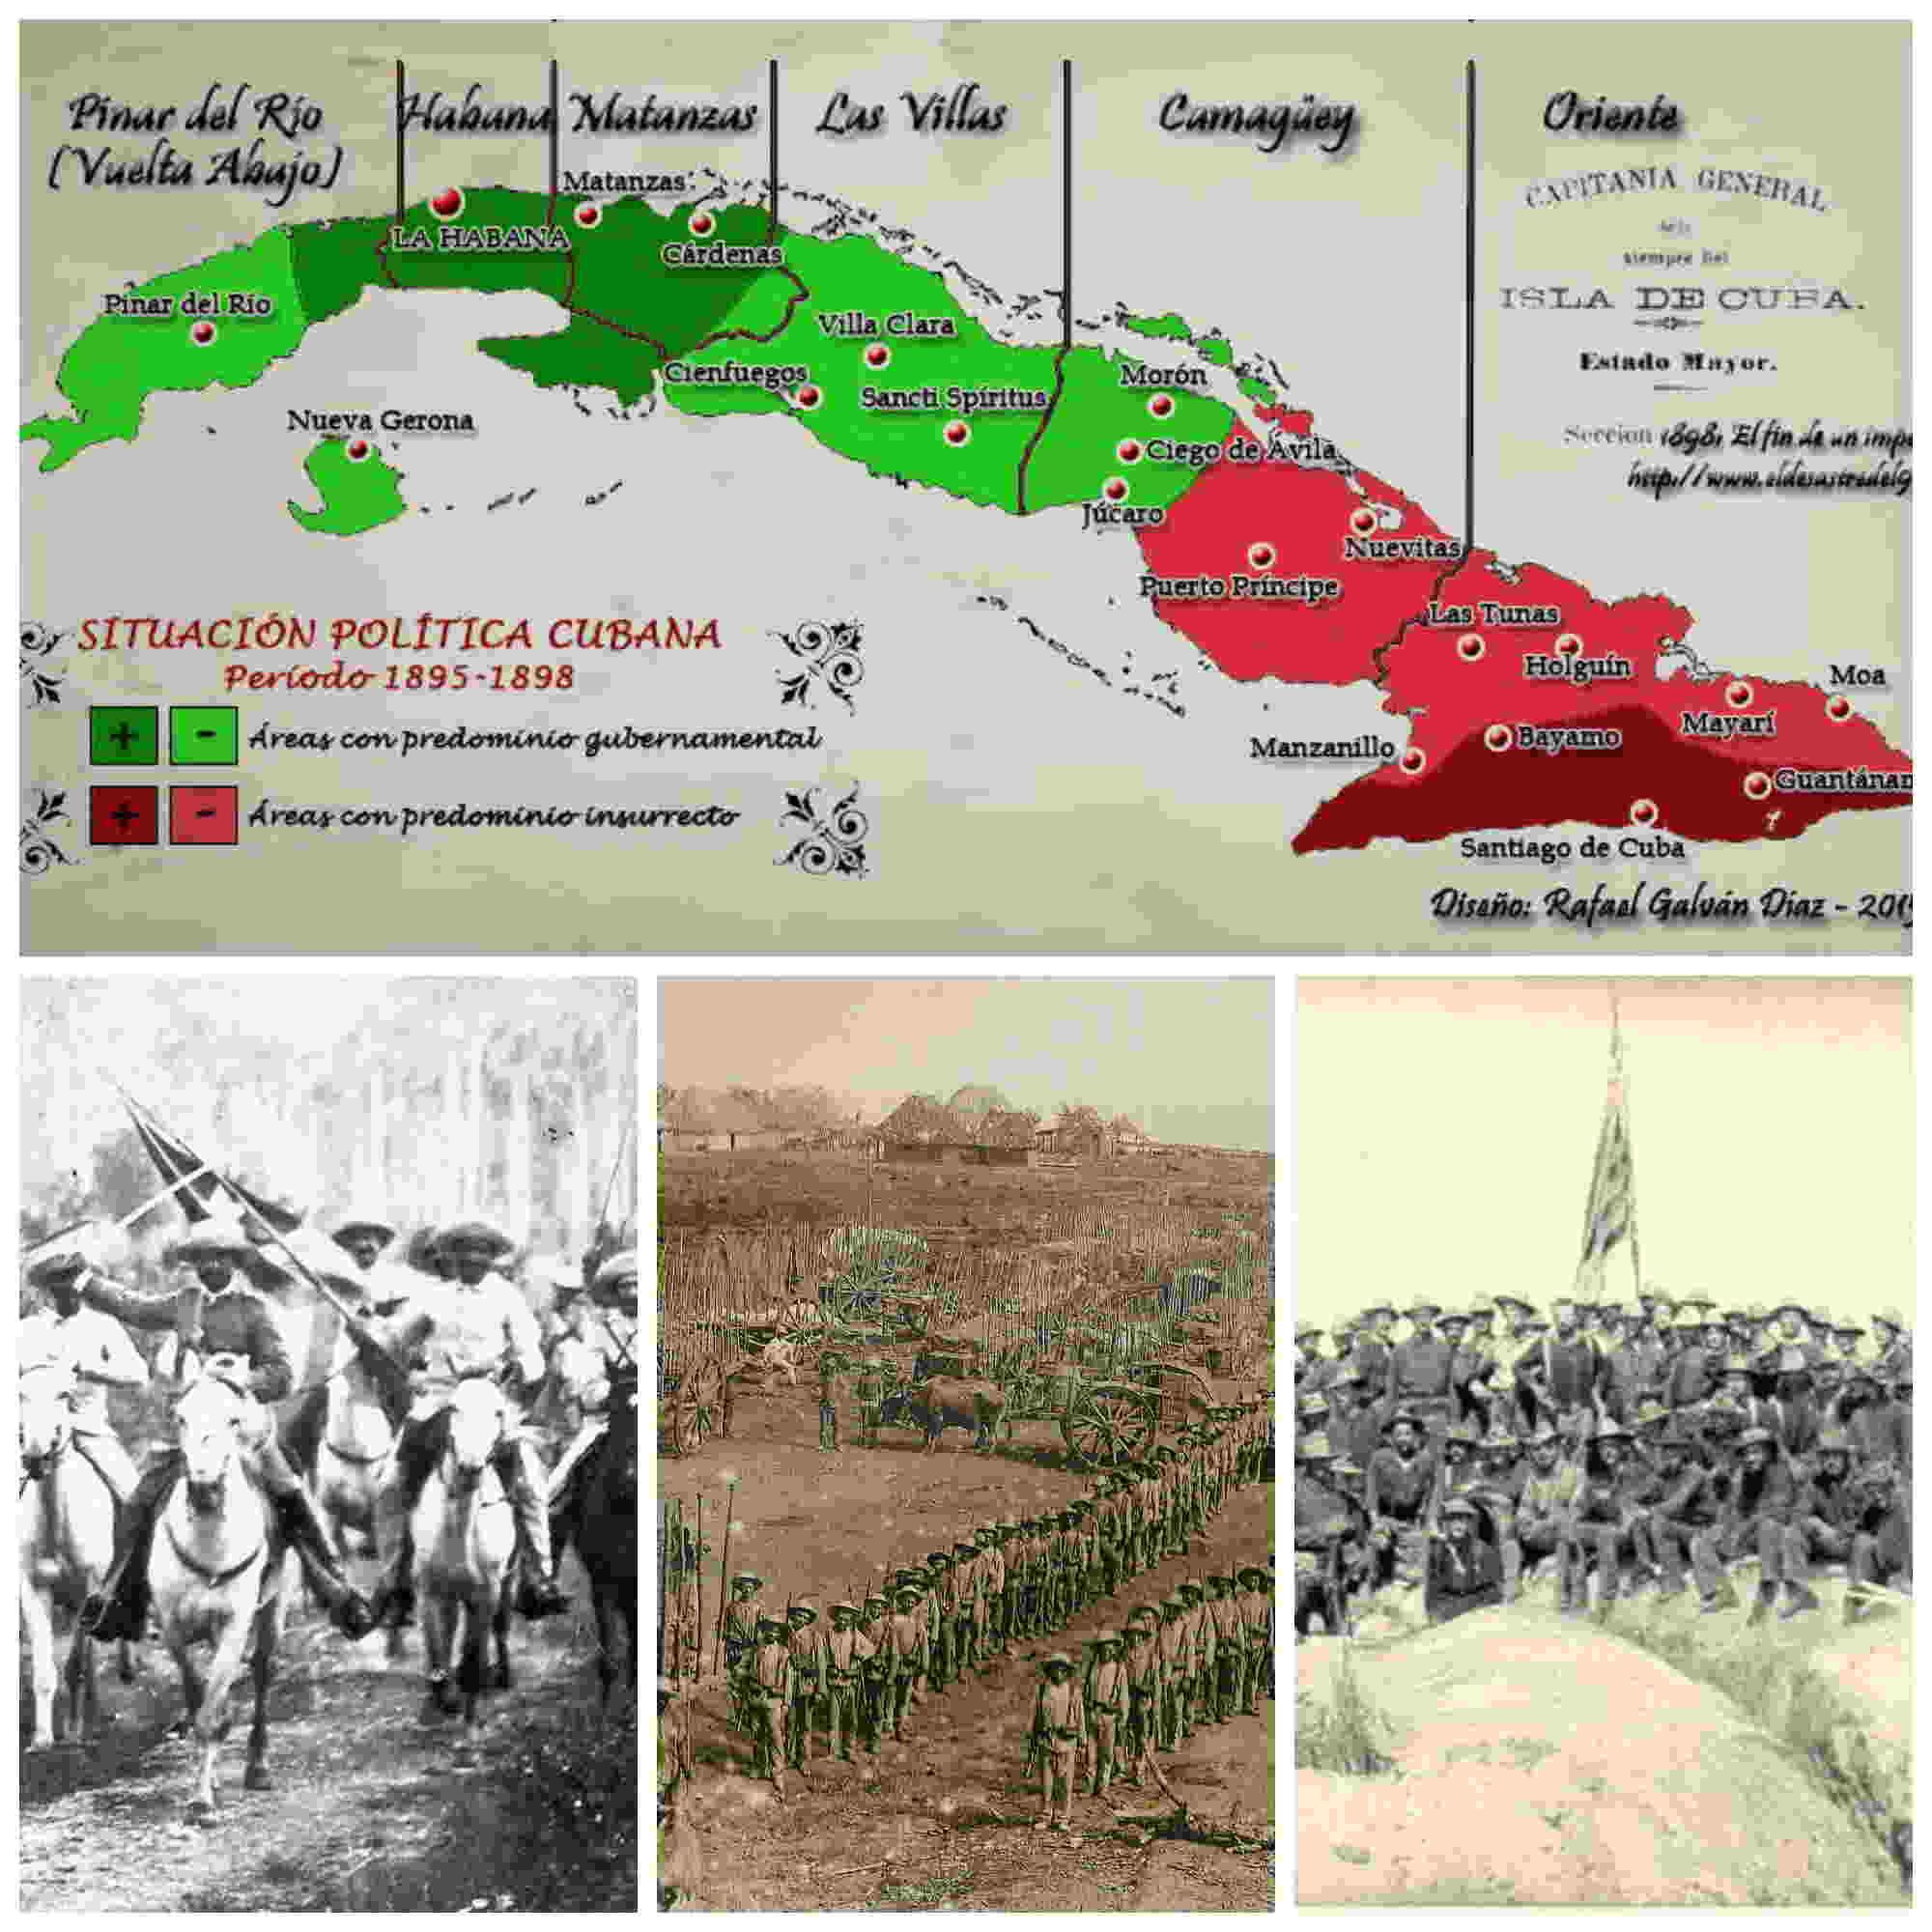 Santiago de Cuba, la campaña de 1898  (I)